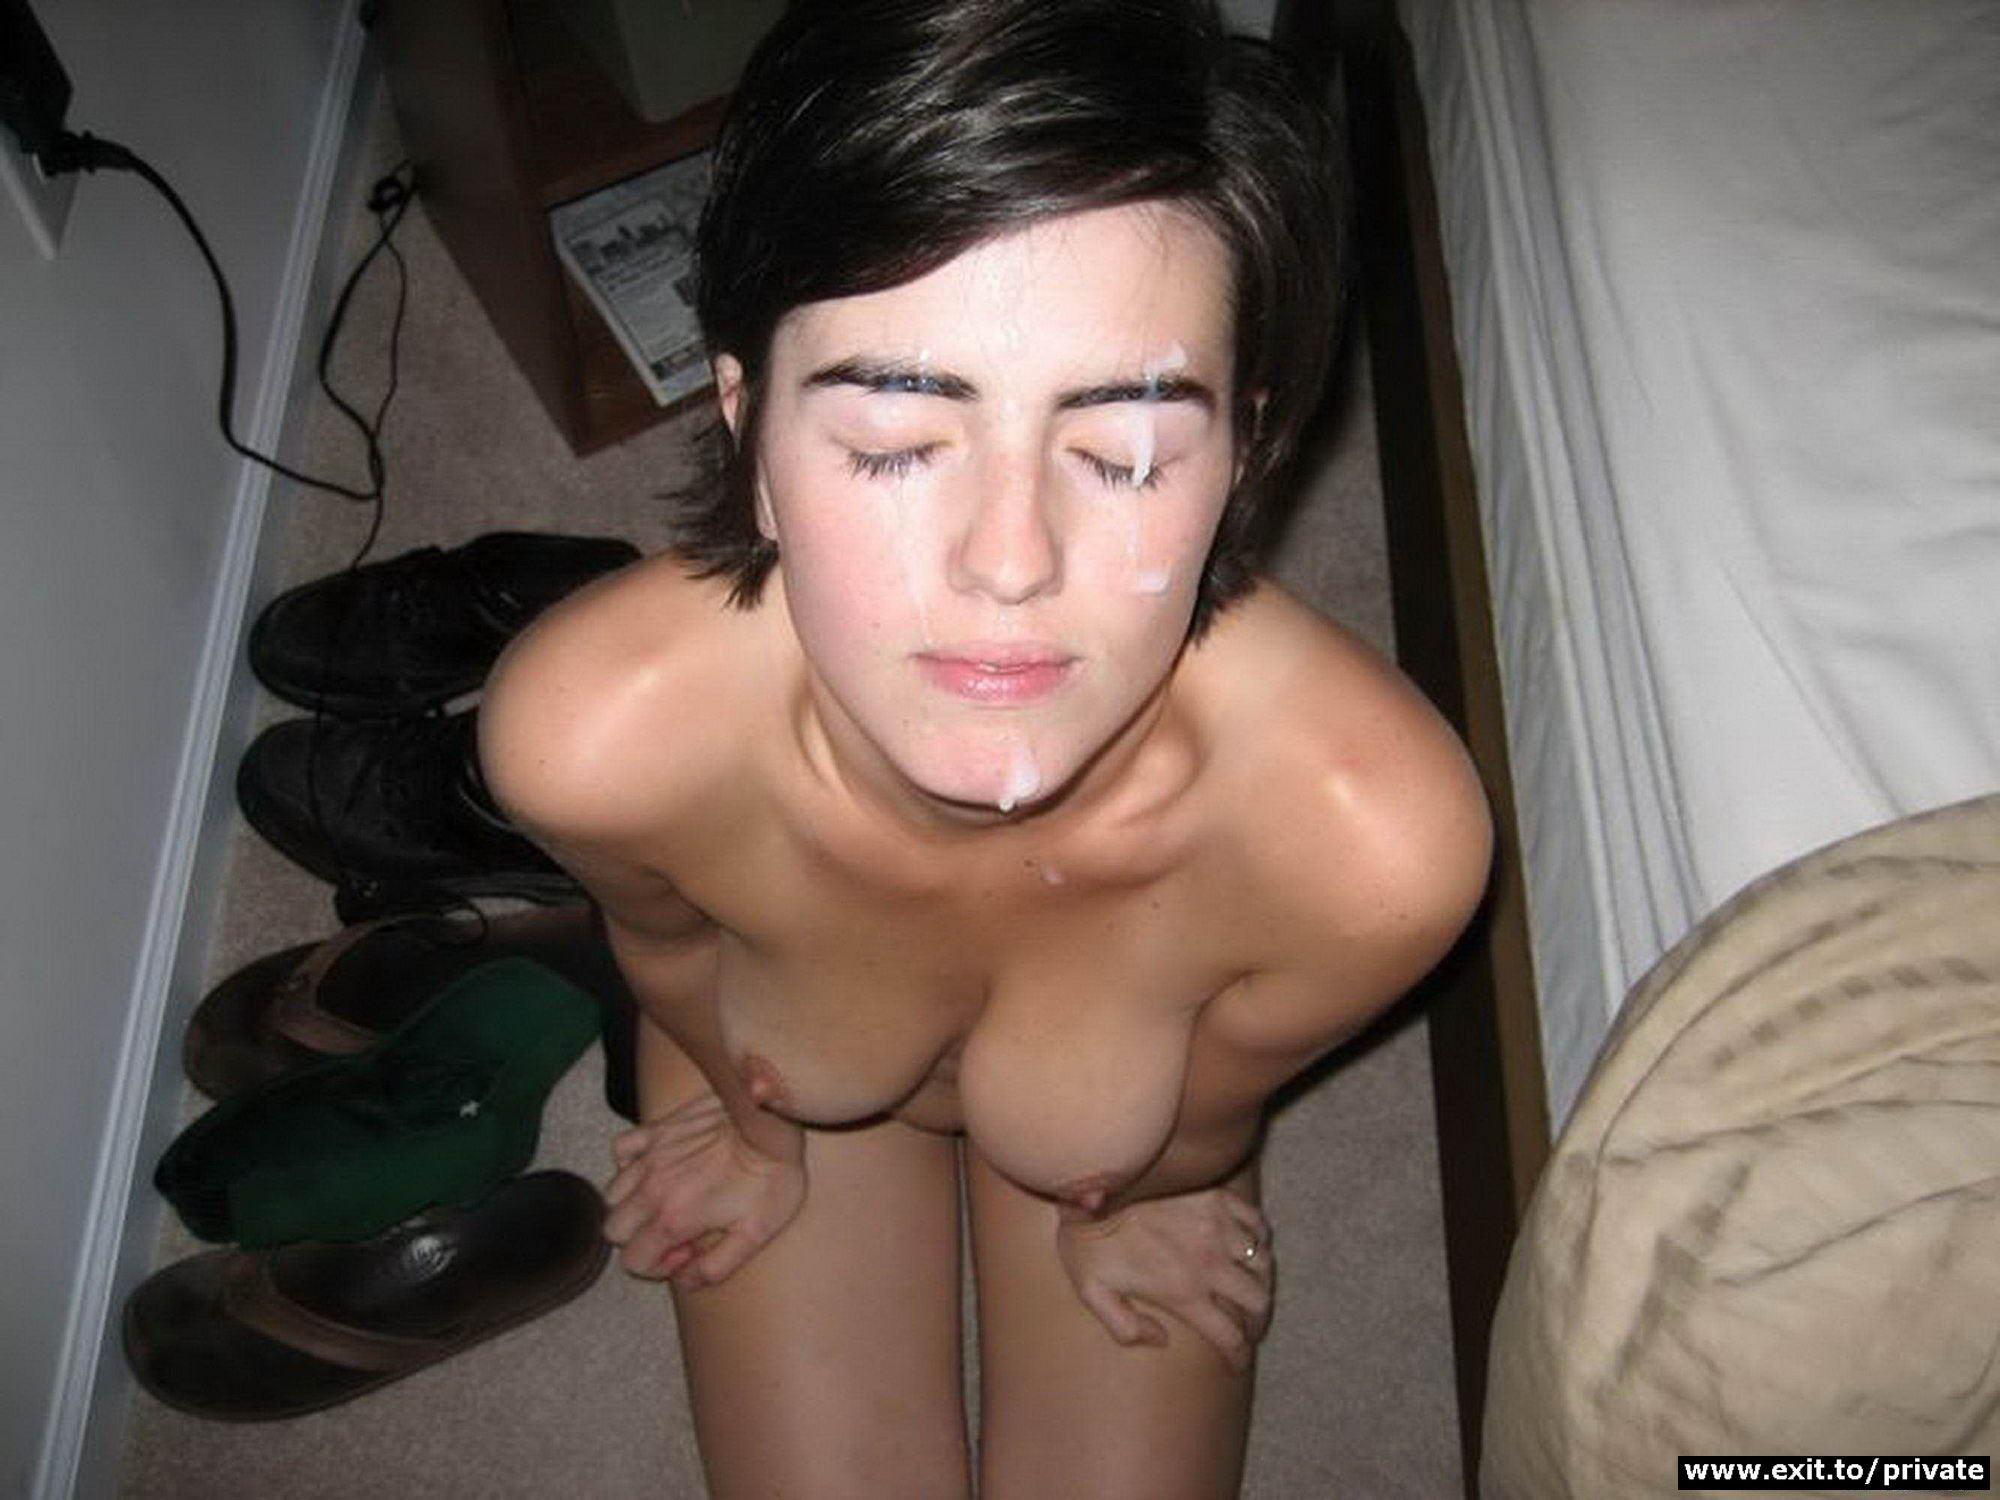 Серма на лицо 13 фотография